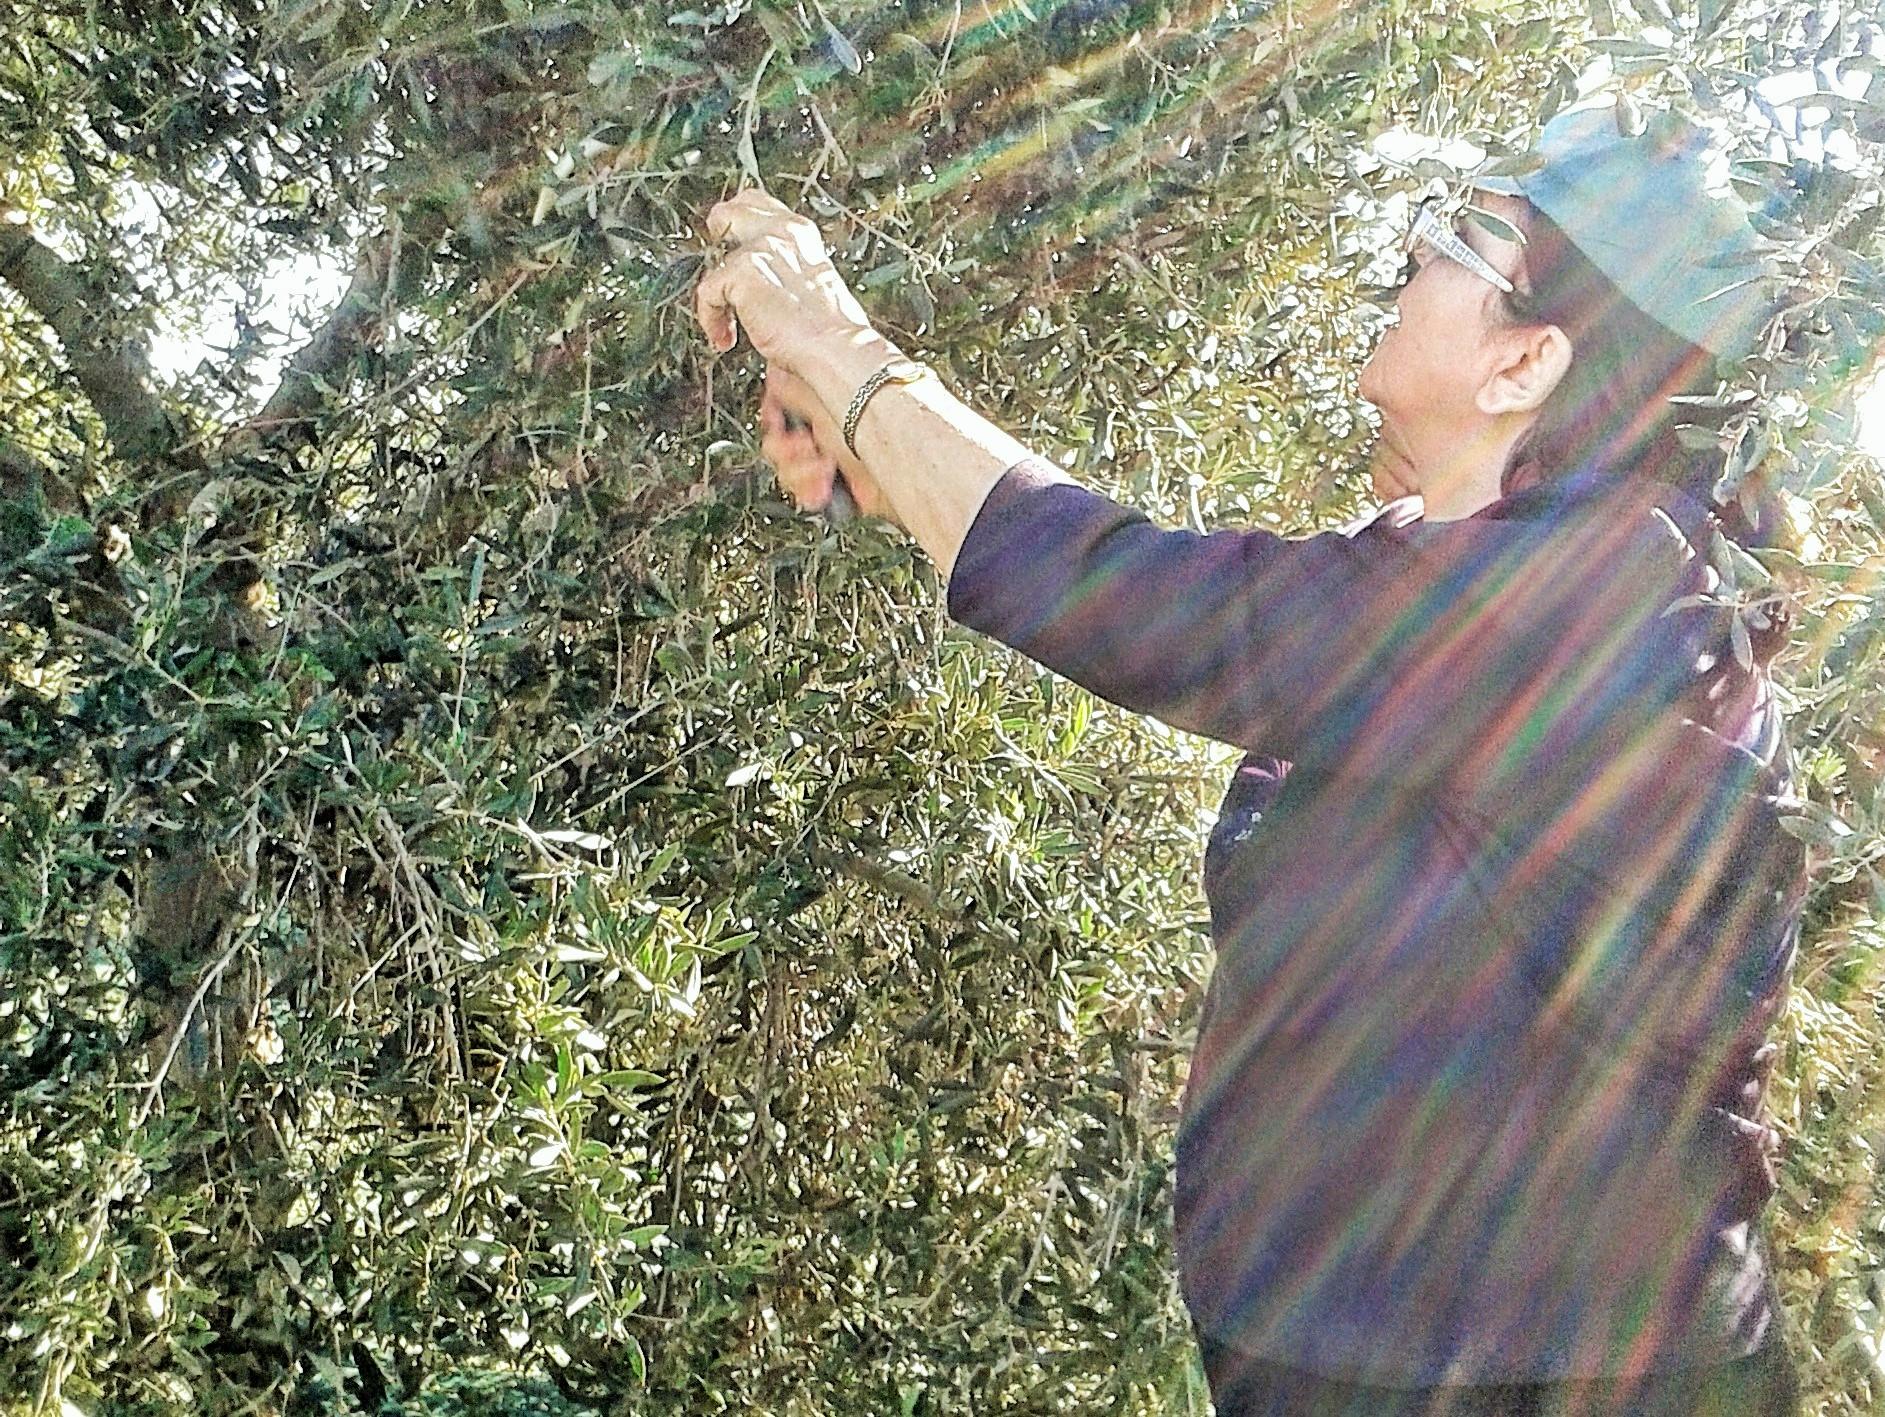 Chloe harvesting the olives